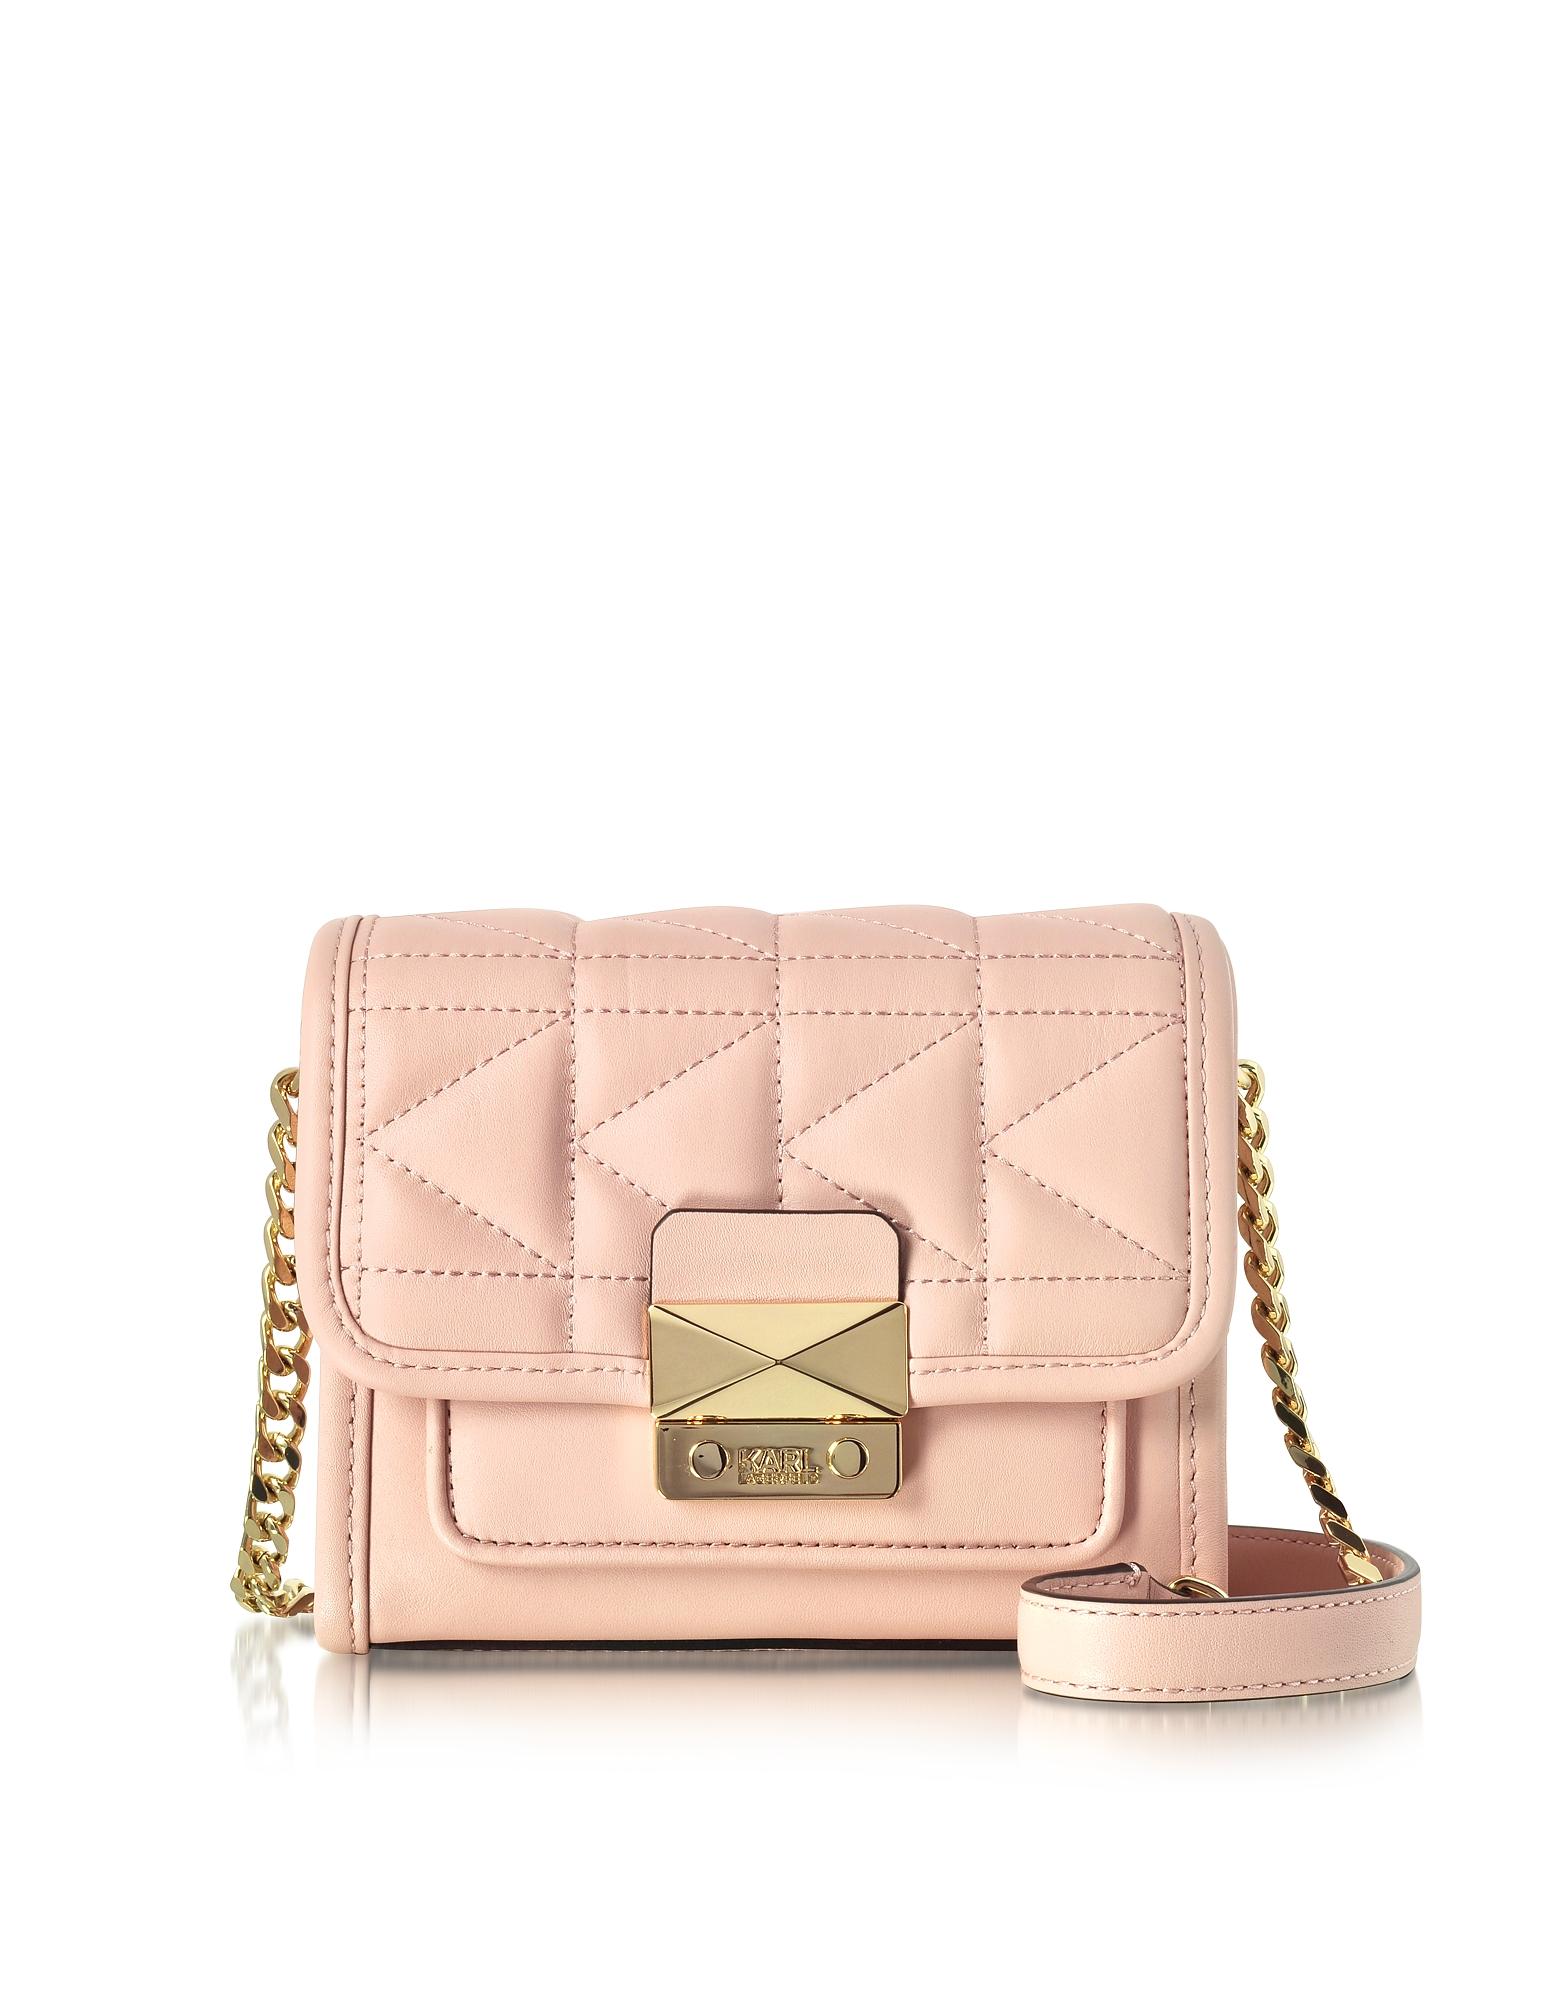 Karl Lagerfeld Handbags, Light Pink K/Kuilted Crossbody Bag